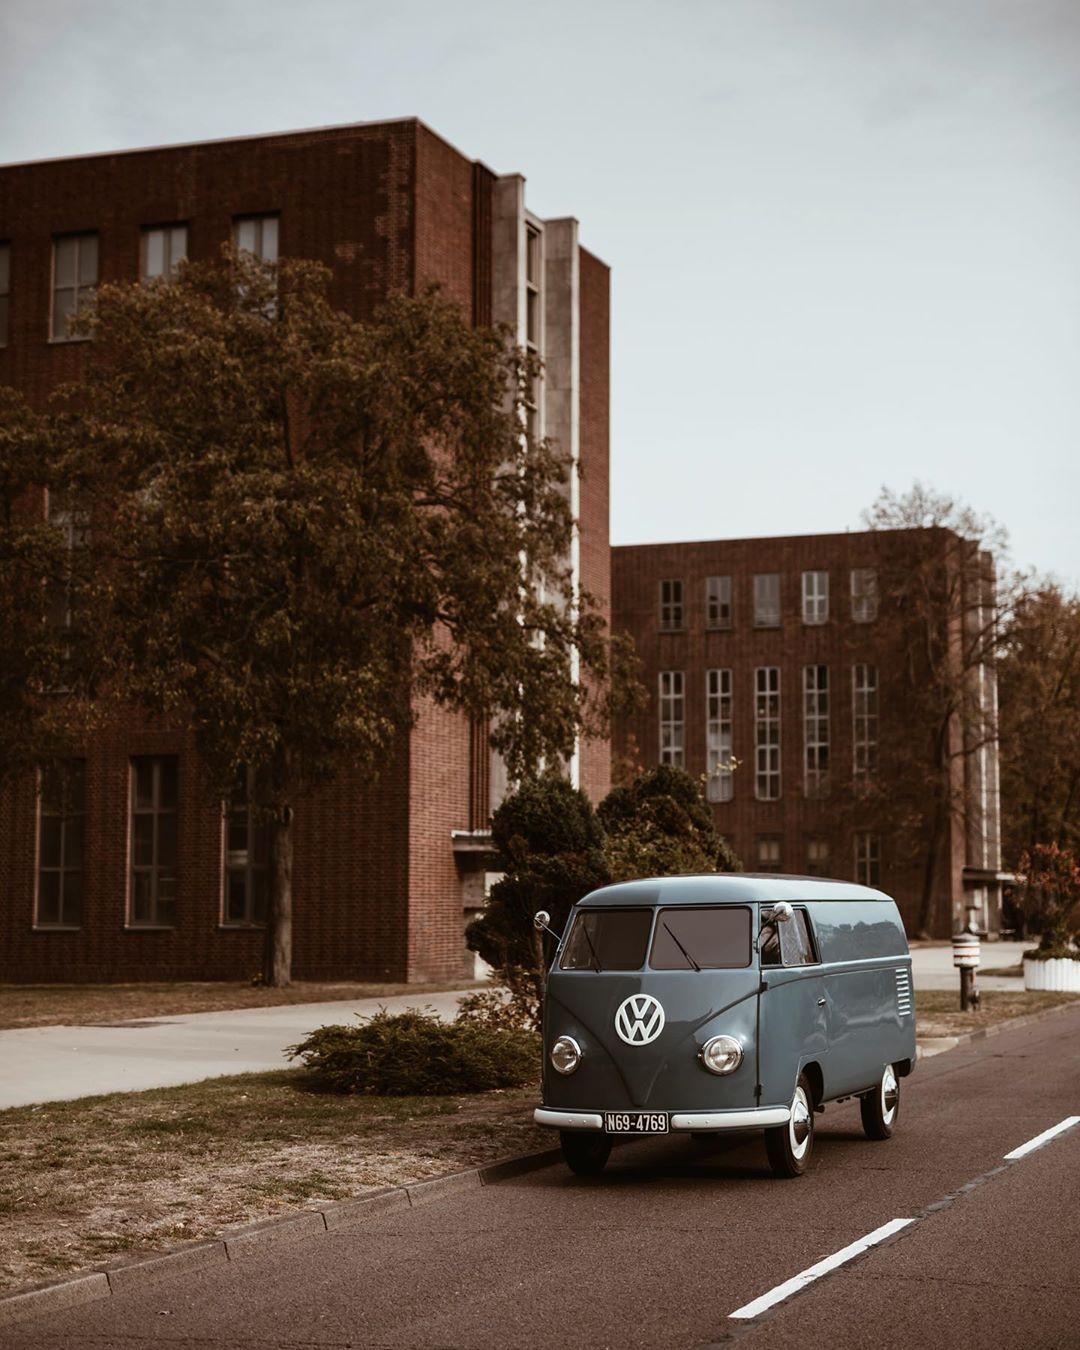 Roman Ratzke On Instagram Wolfsburg 1950 Asif Shot For Autobildklassik Volkswagen Volkswagen Bus Instagram